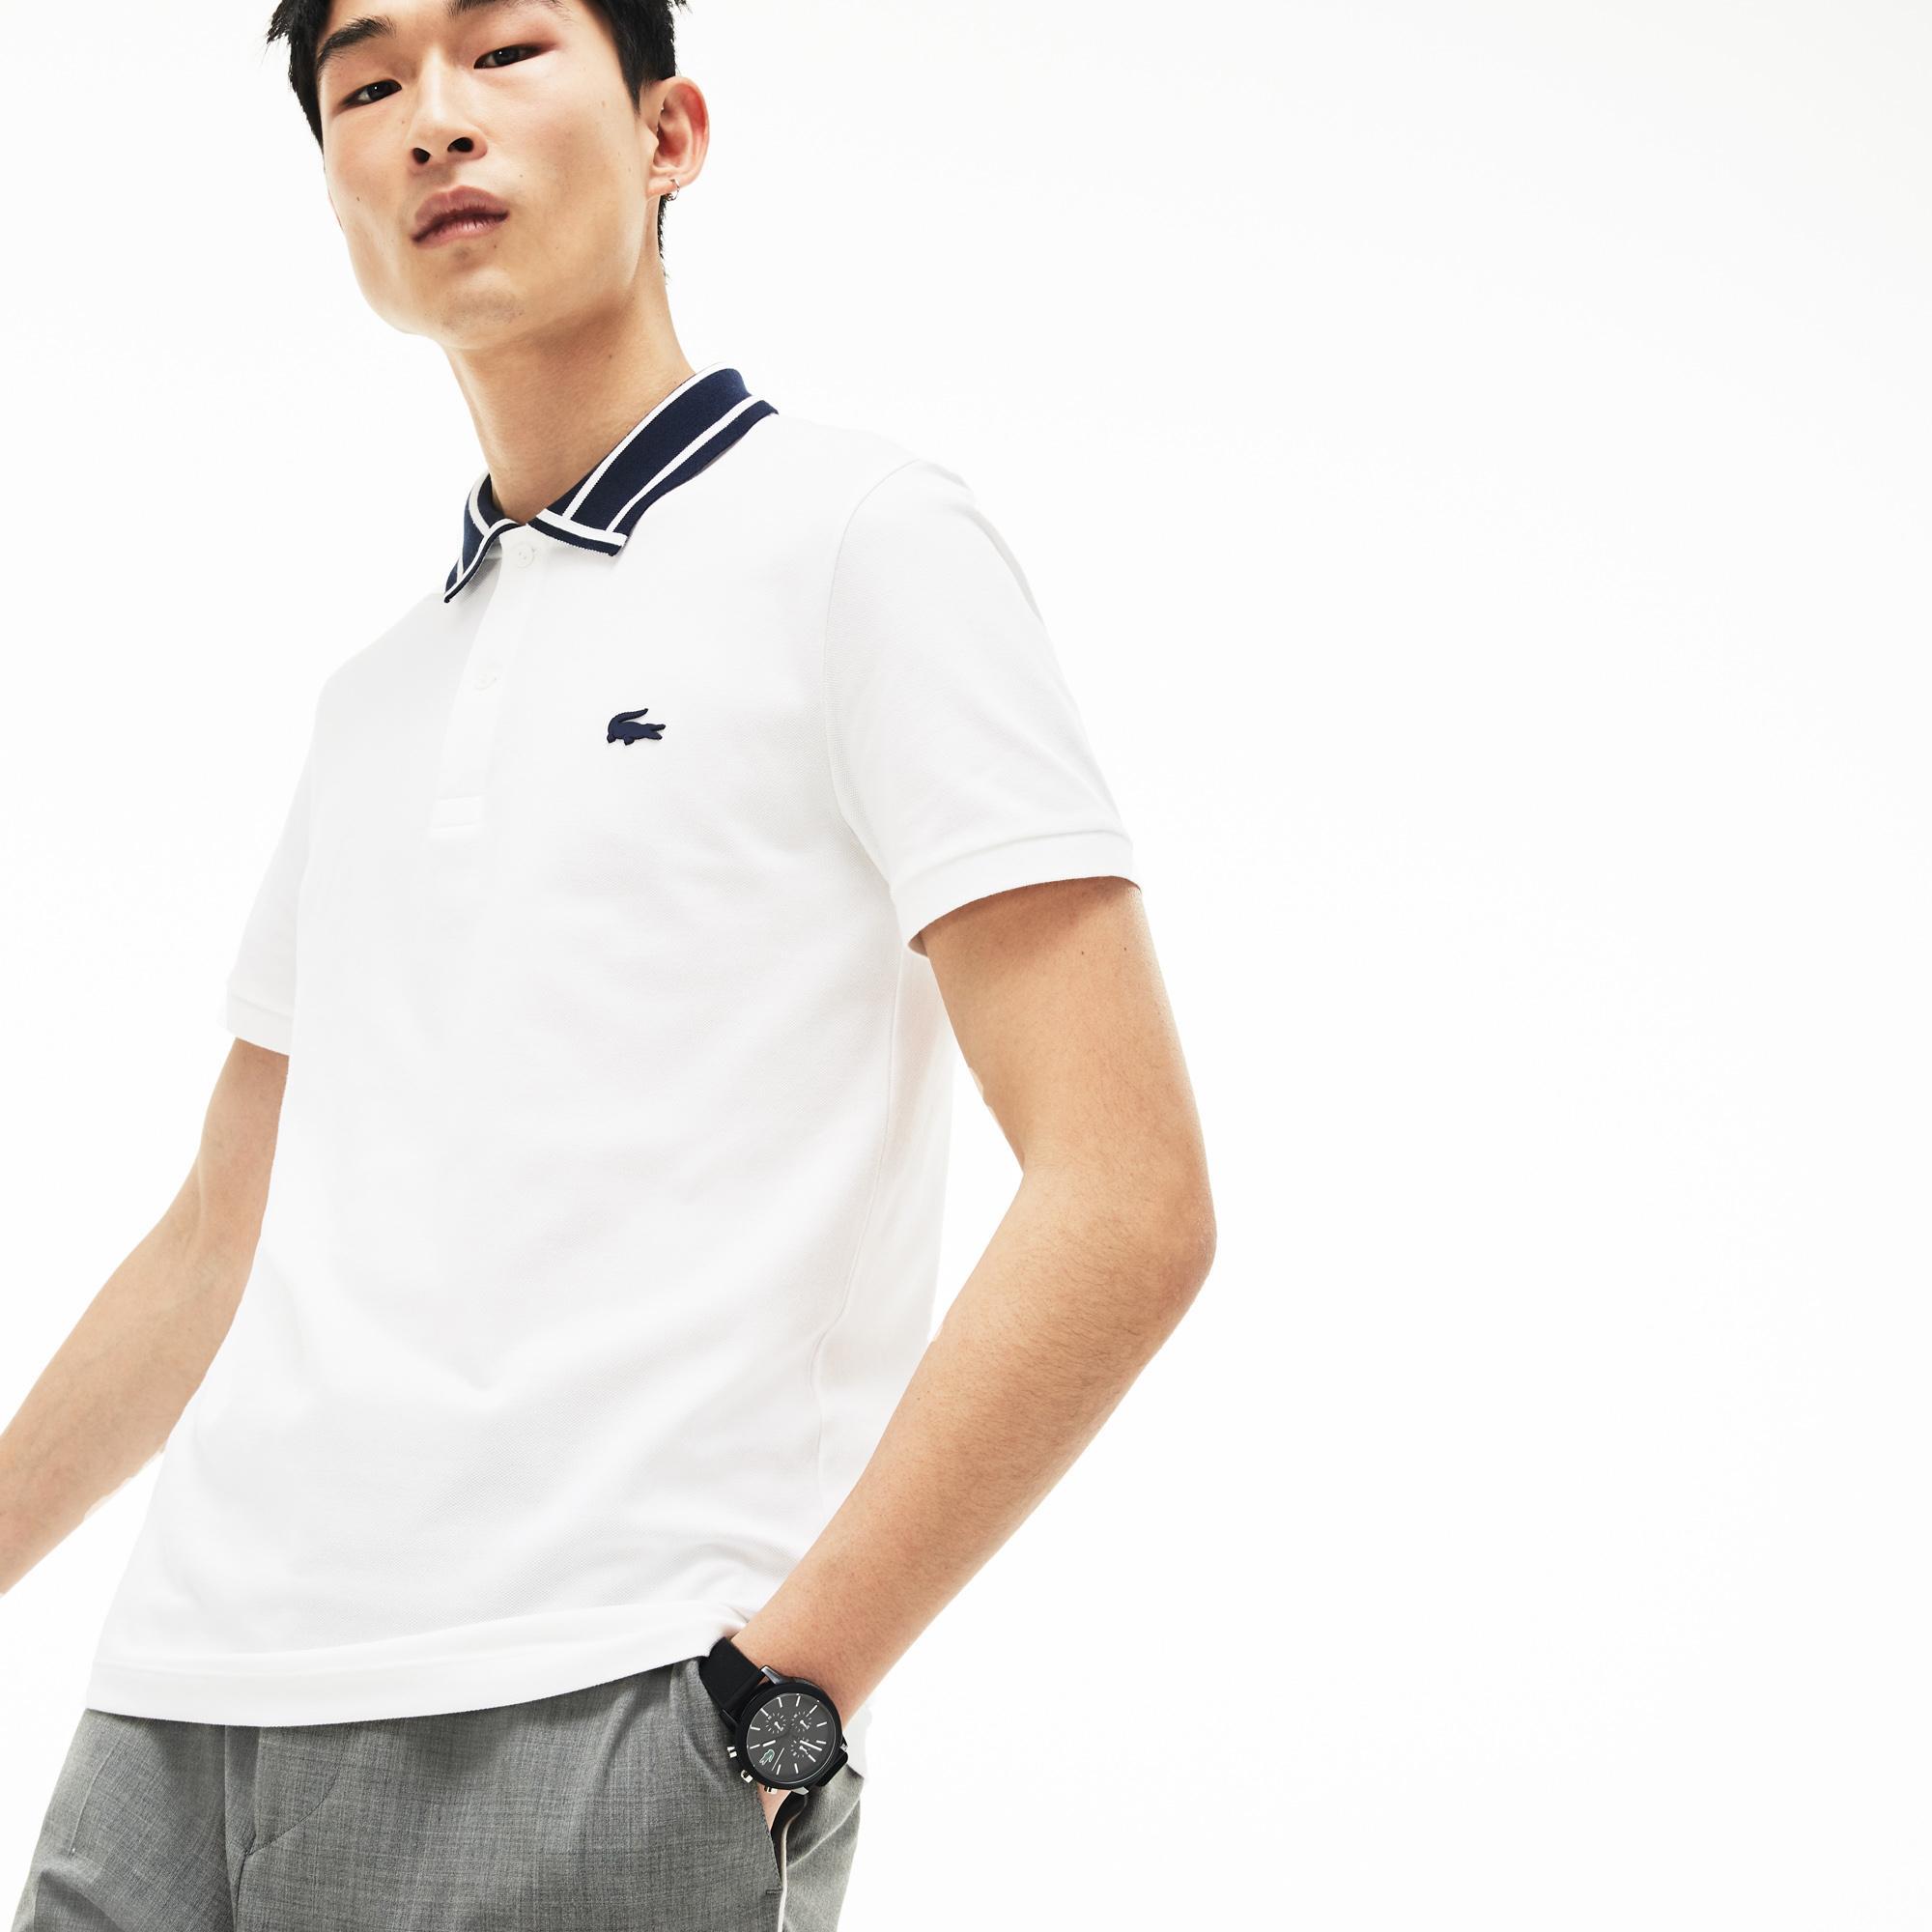 Lacoste Men's Short Sleeves Polo